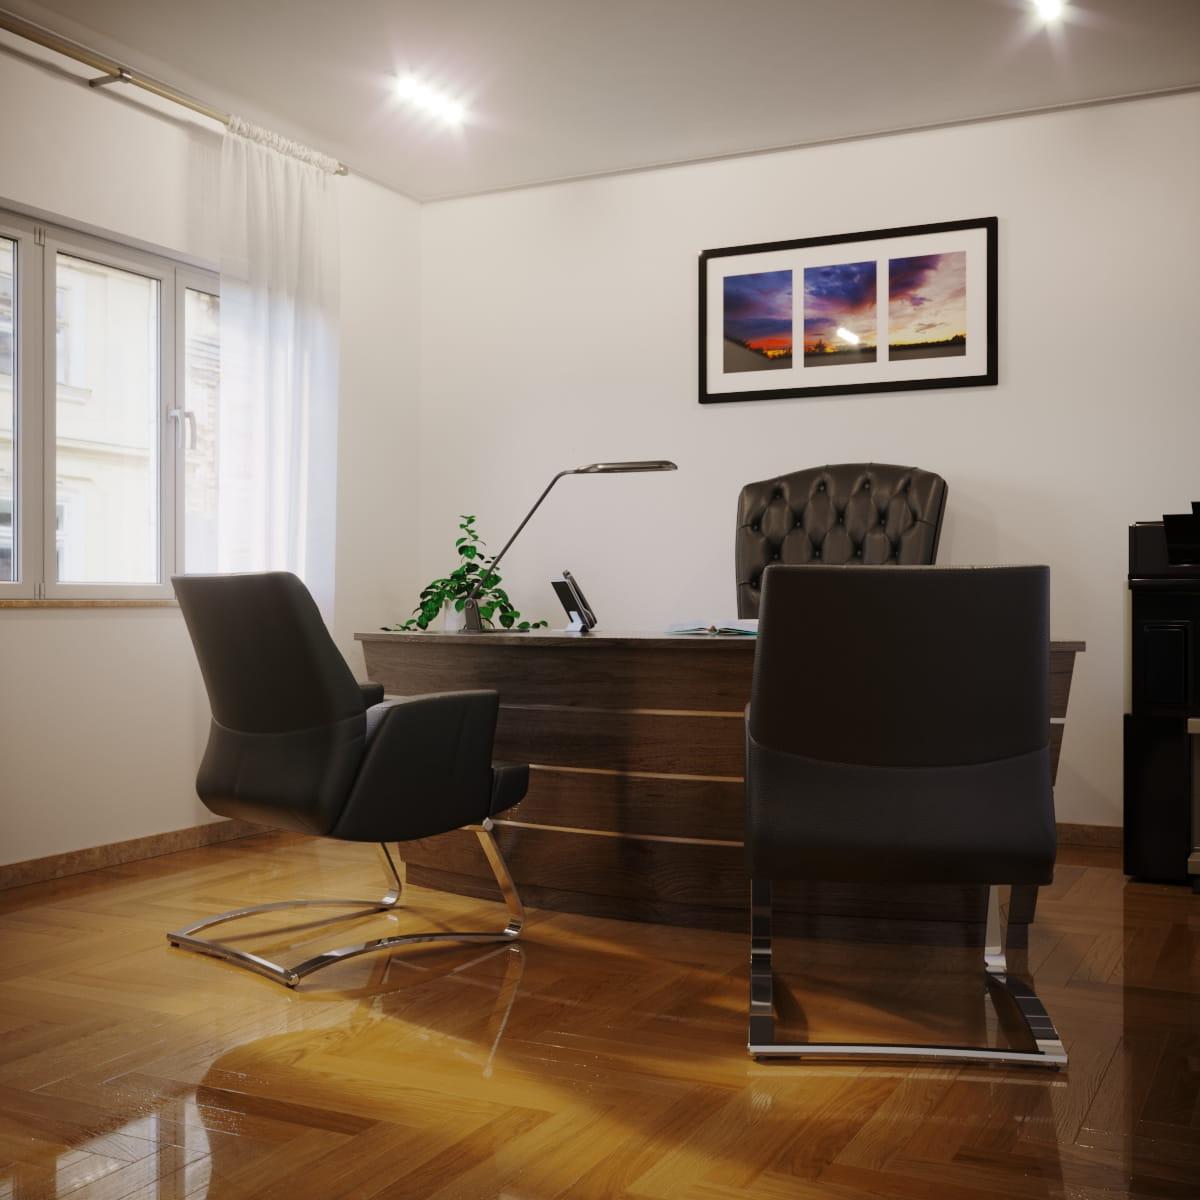 rendering arredamento ufficio - rendering interni - rendering arredamento - rendering foto realistici - render foto realistici